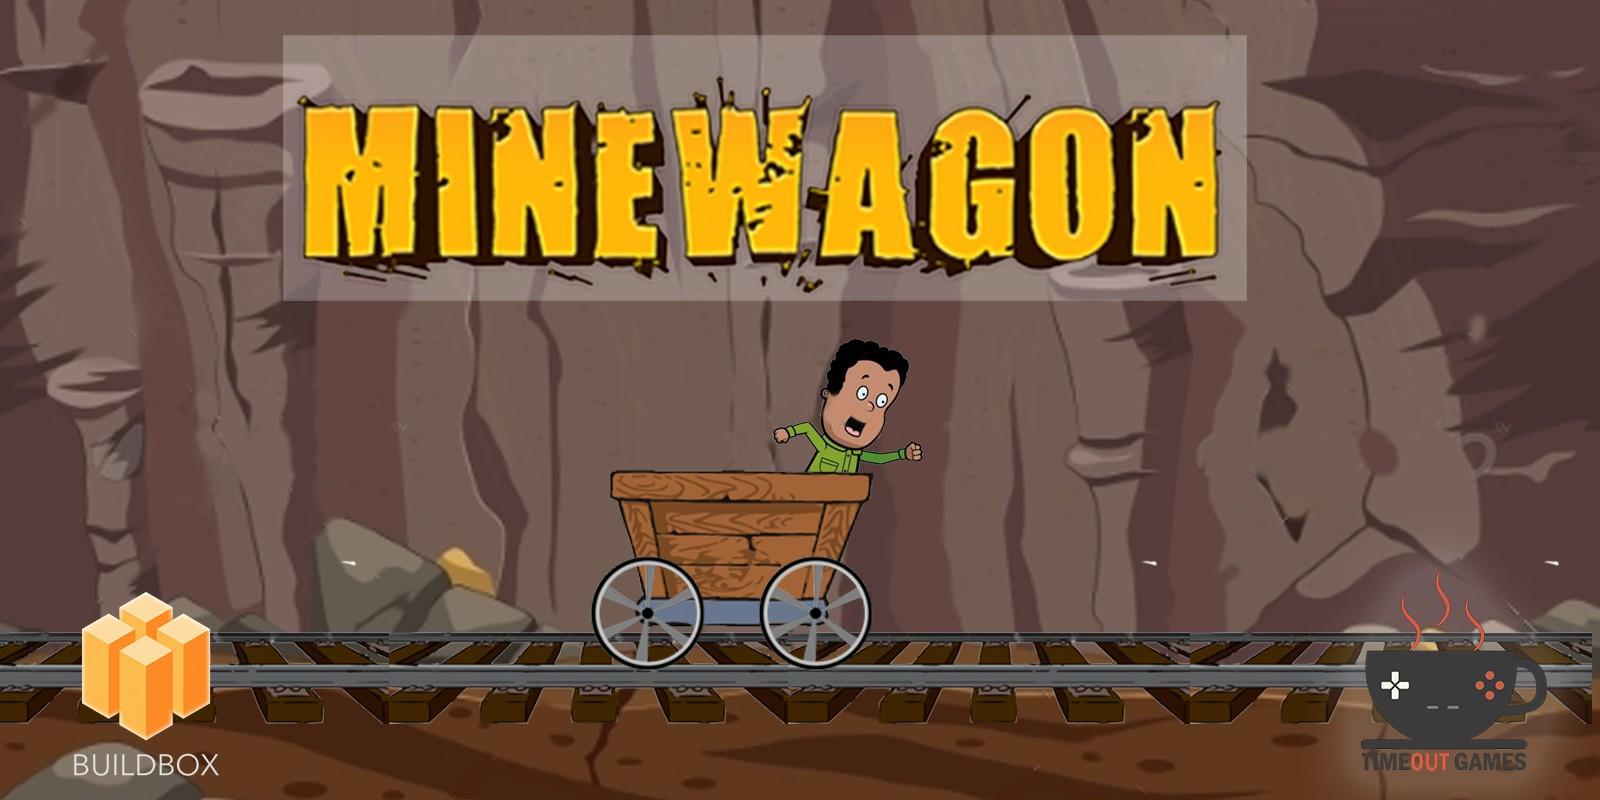 Minewagon - Full Buildbox Game